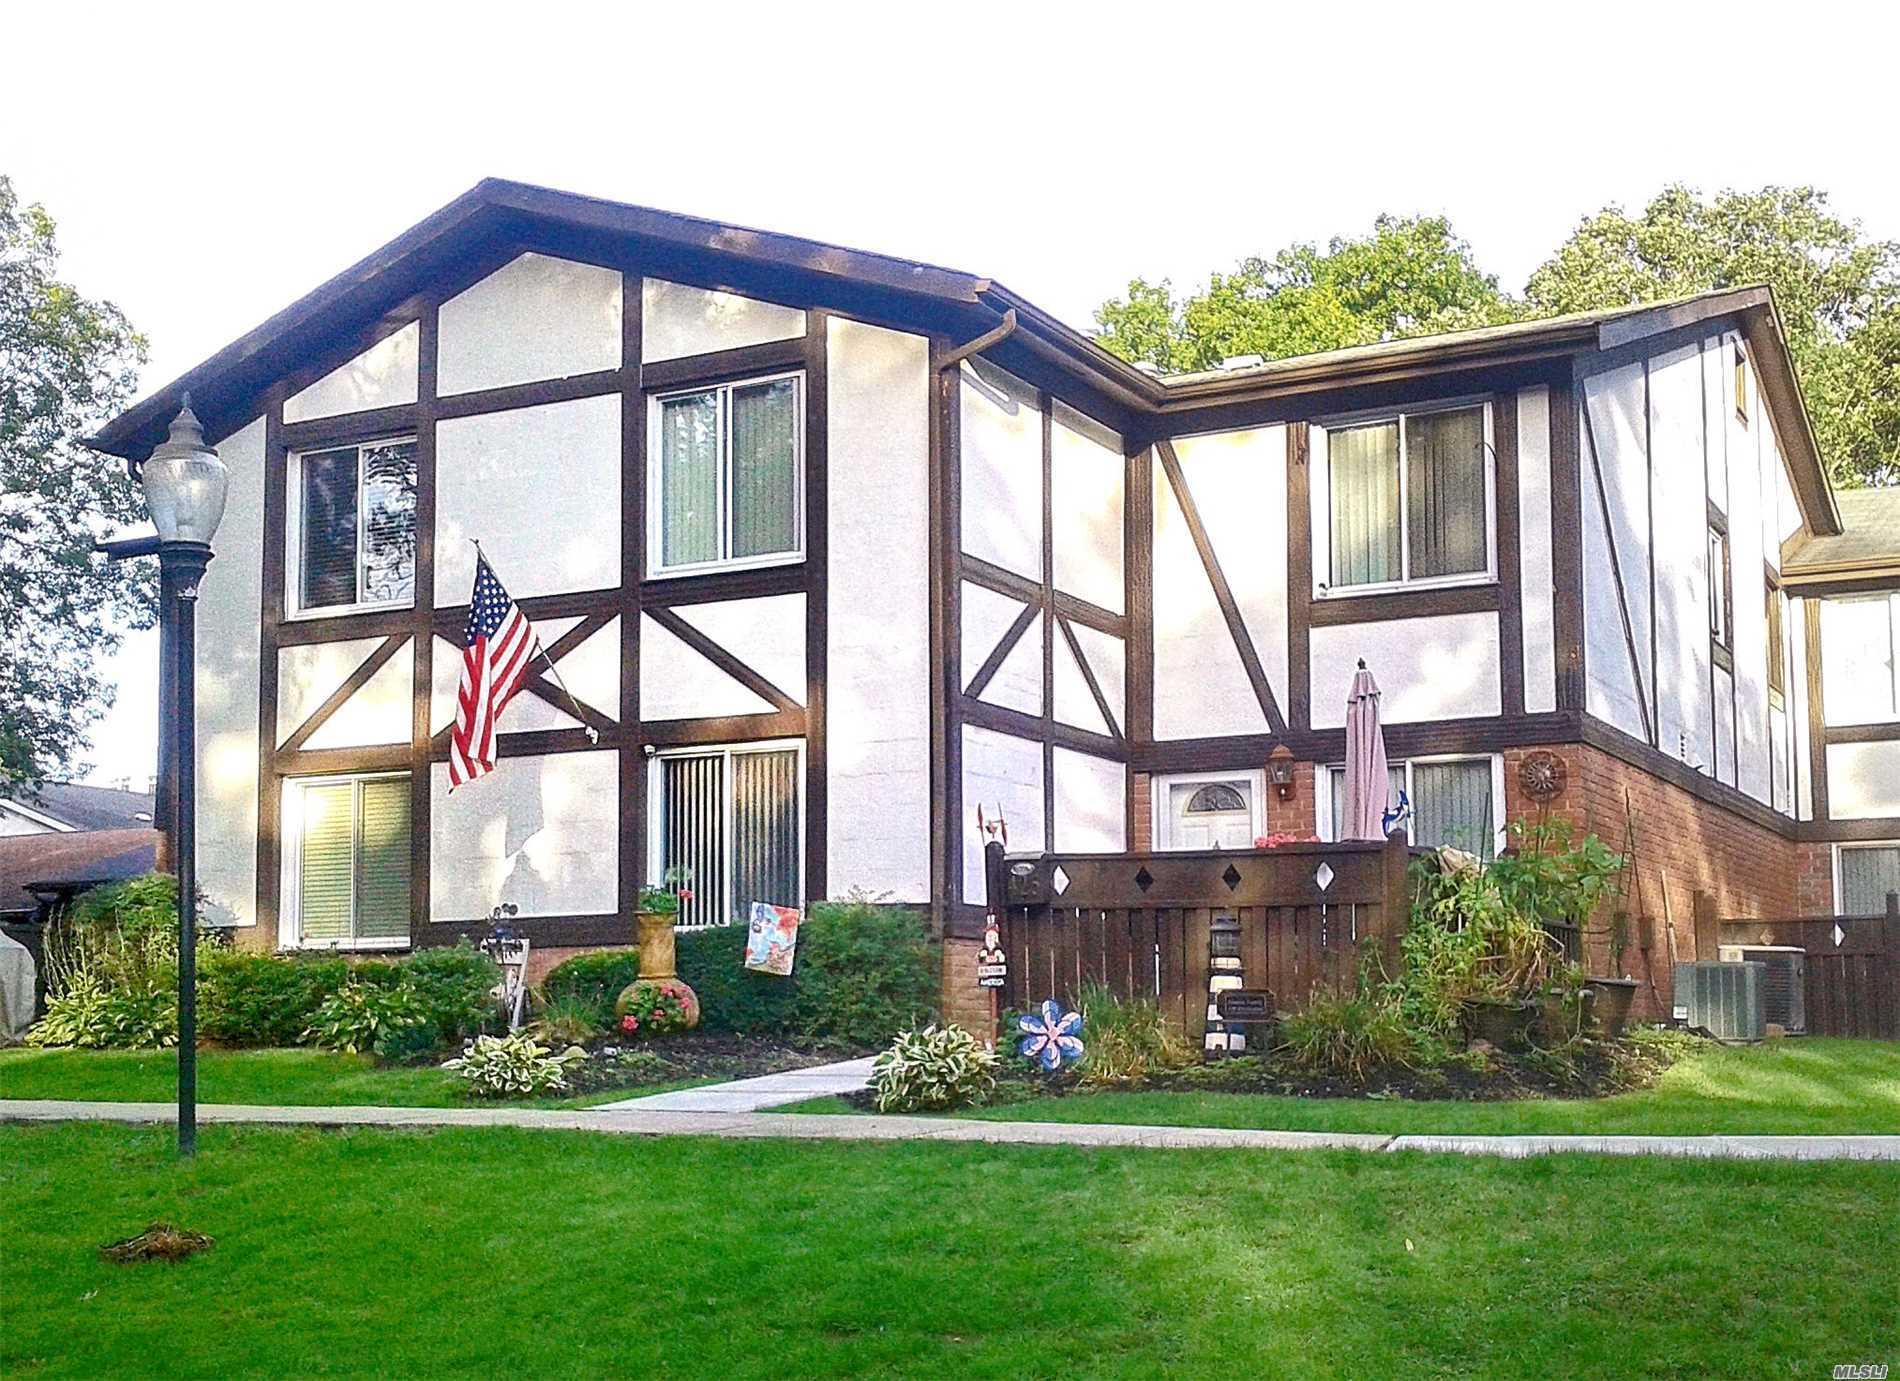 Property for sale at 425 Birchwood Road, Medford NY 11763, Medford,  New York 11763